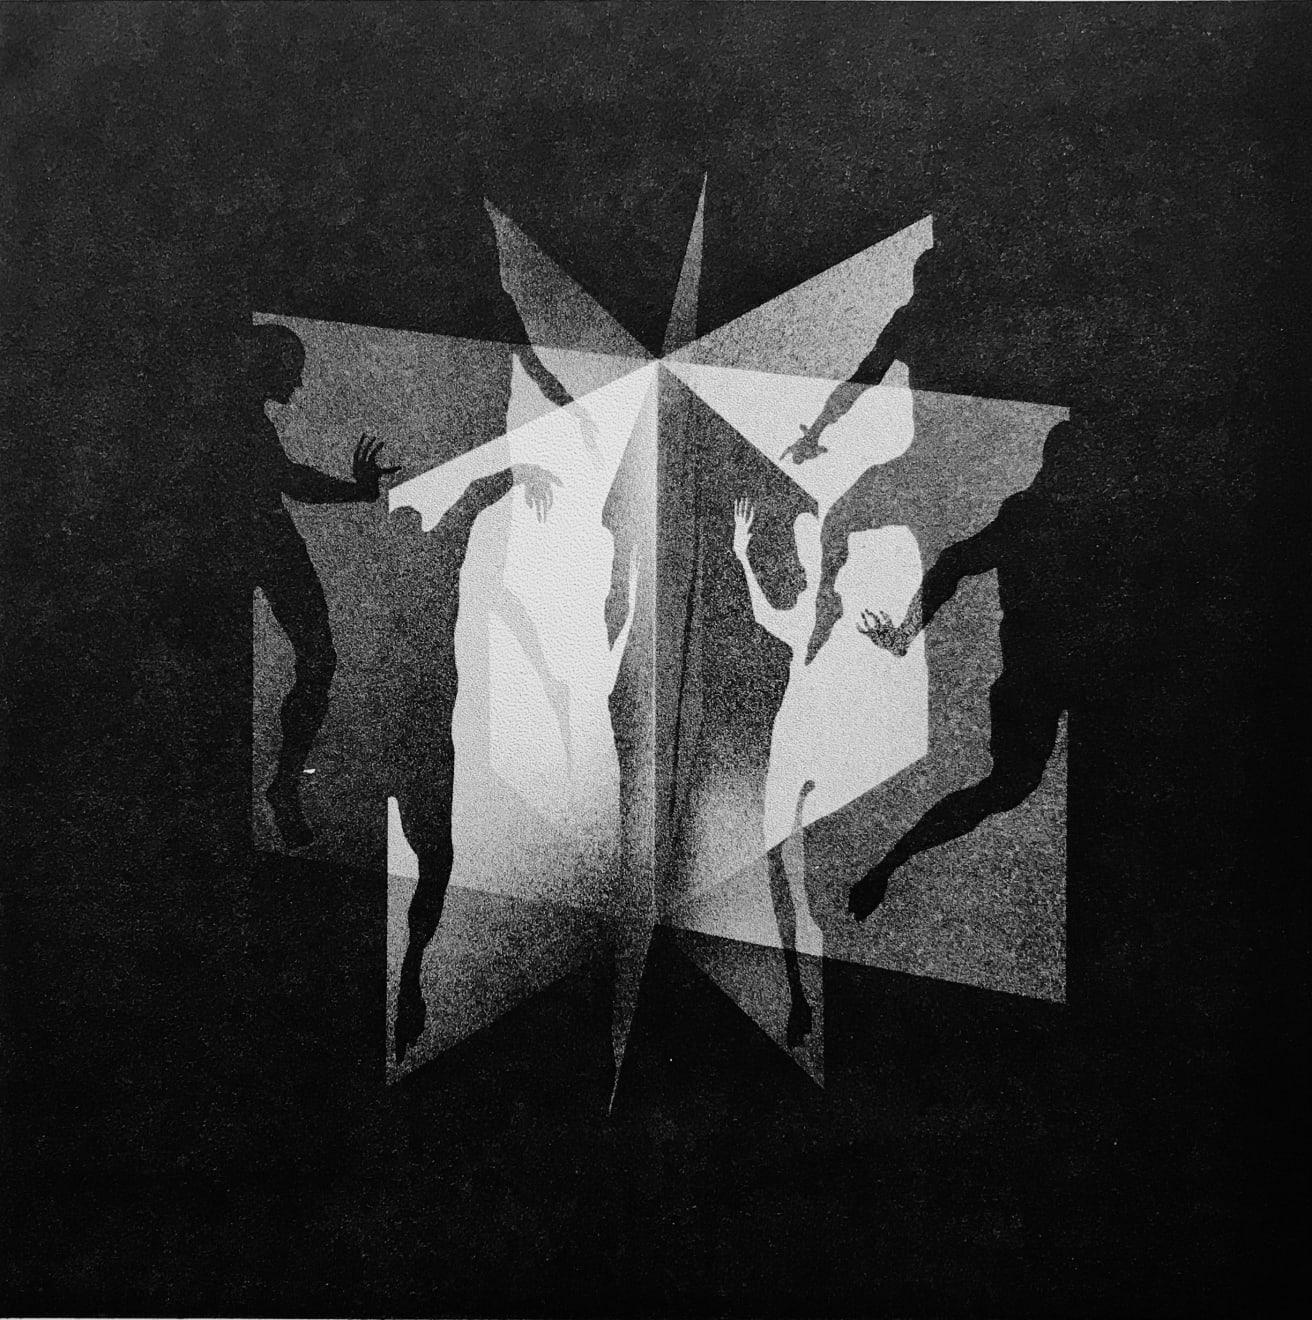 Veta Gorner, Parted Eye, 2020